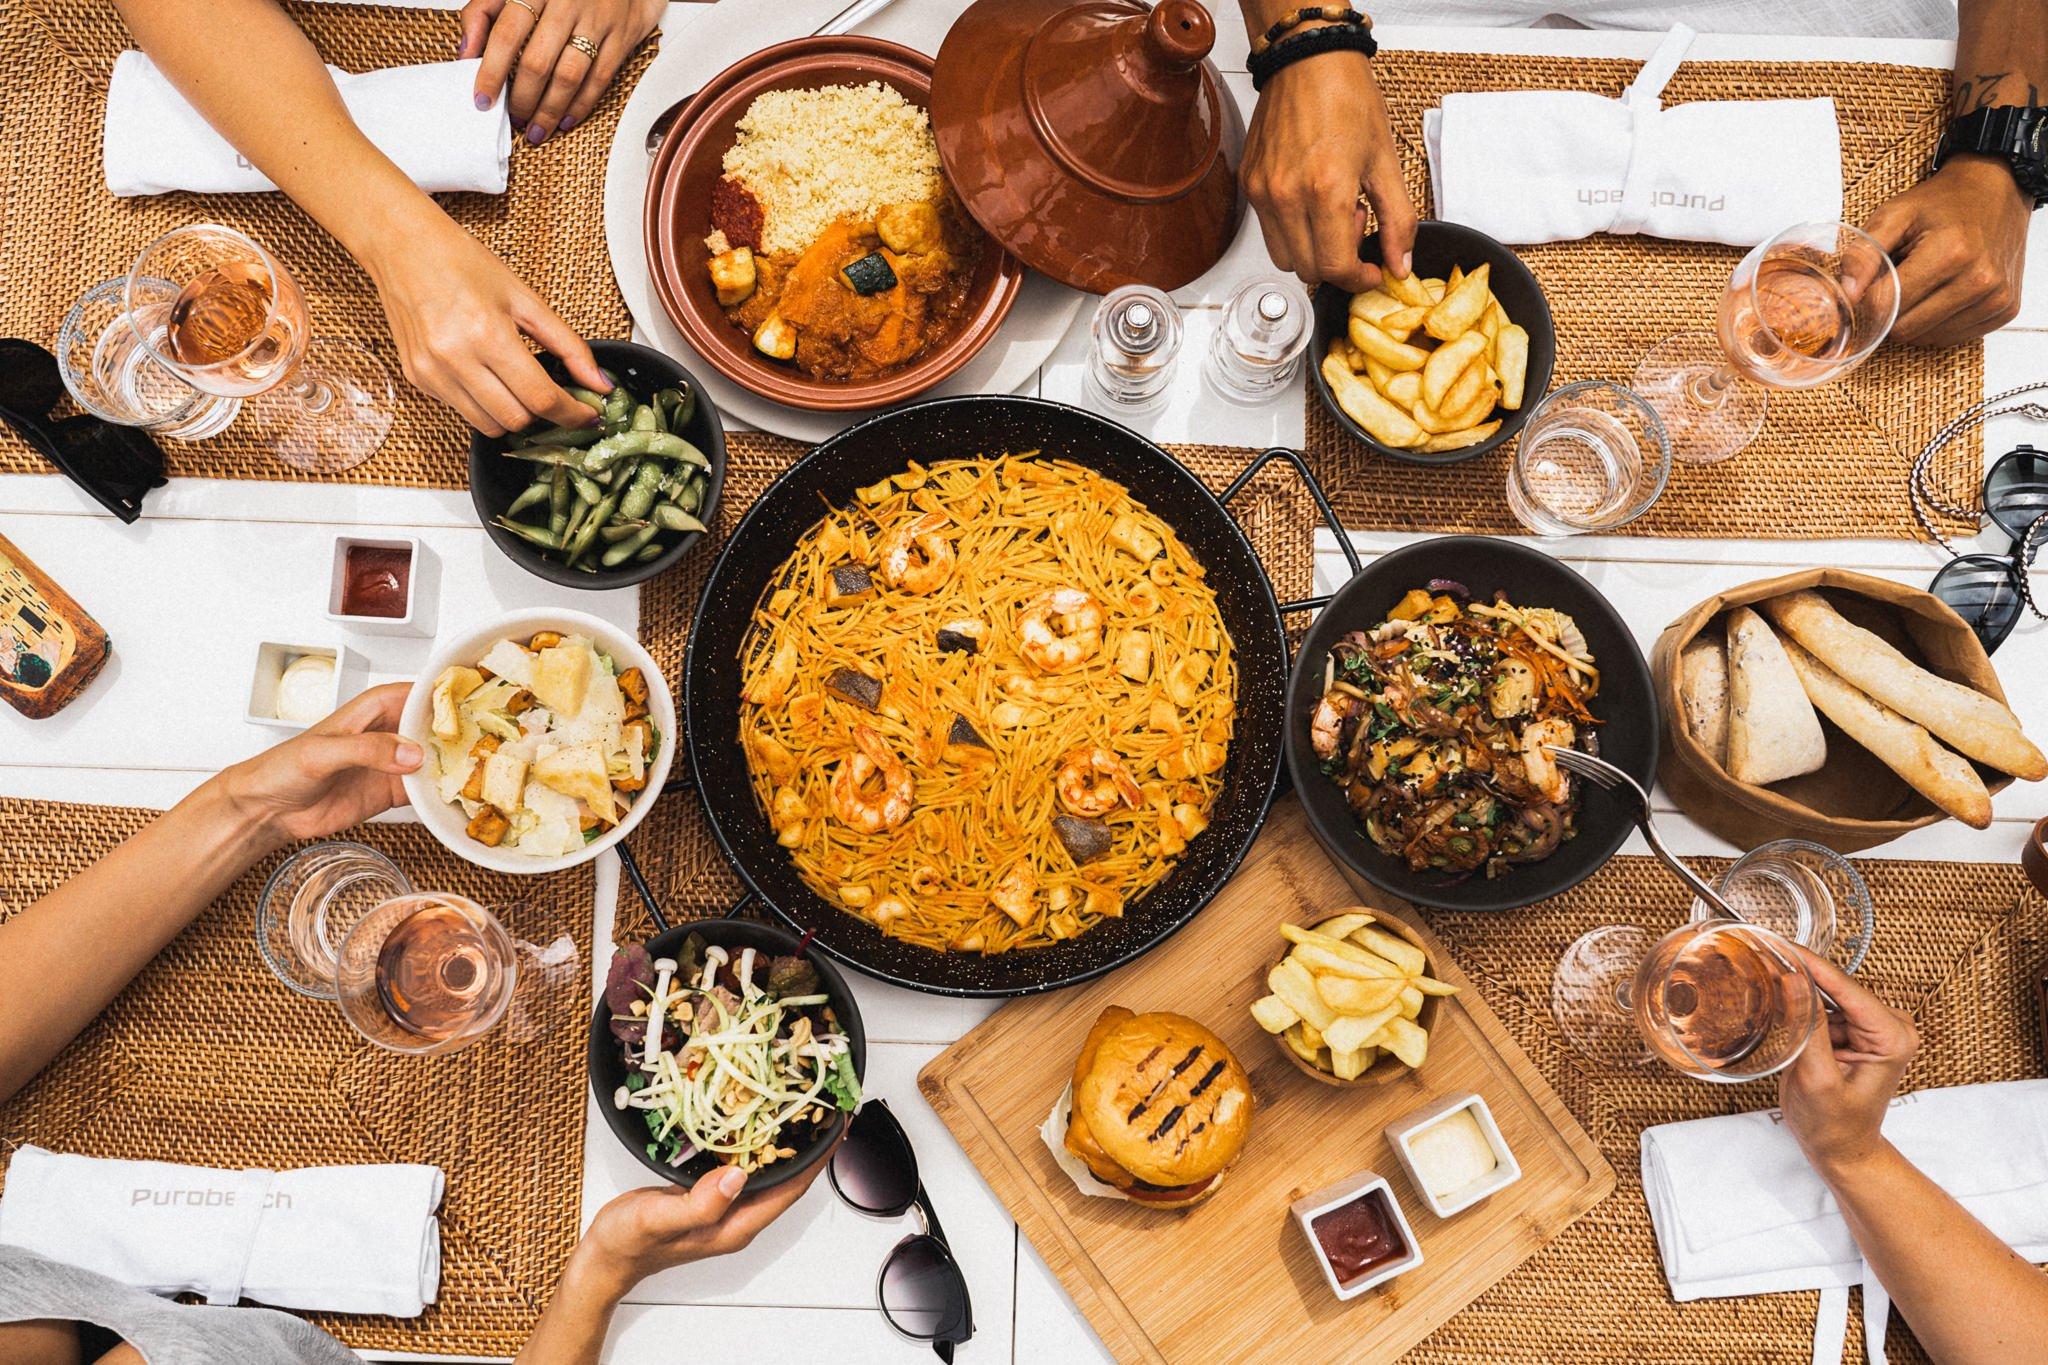 Experiencia gastronómica mediterránea – Purobeach Dénia